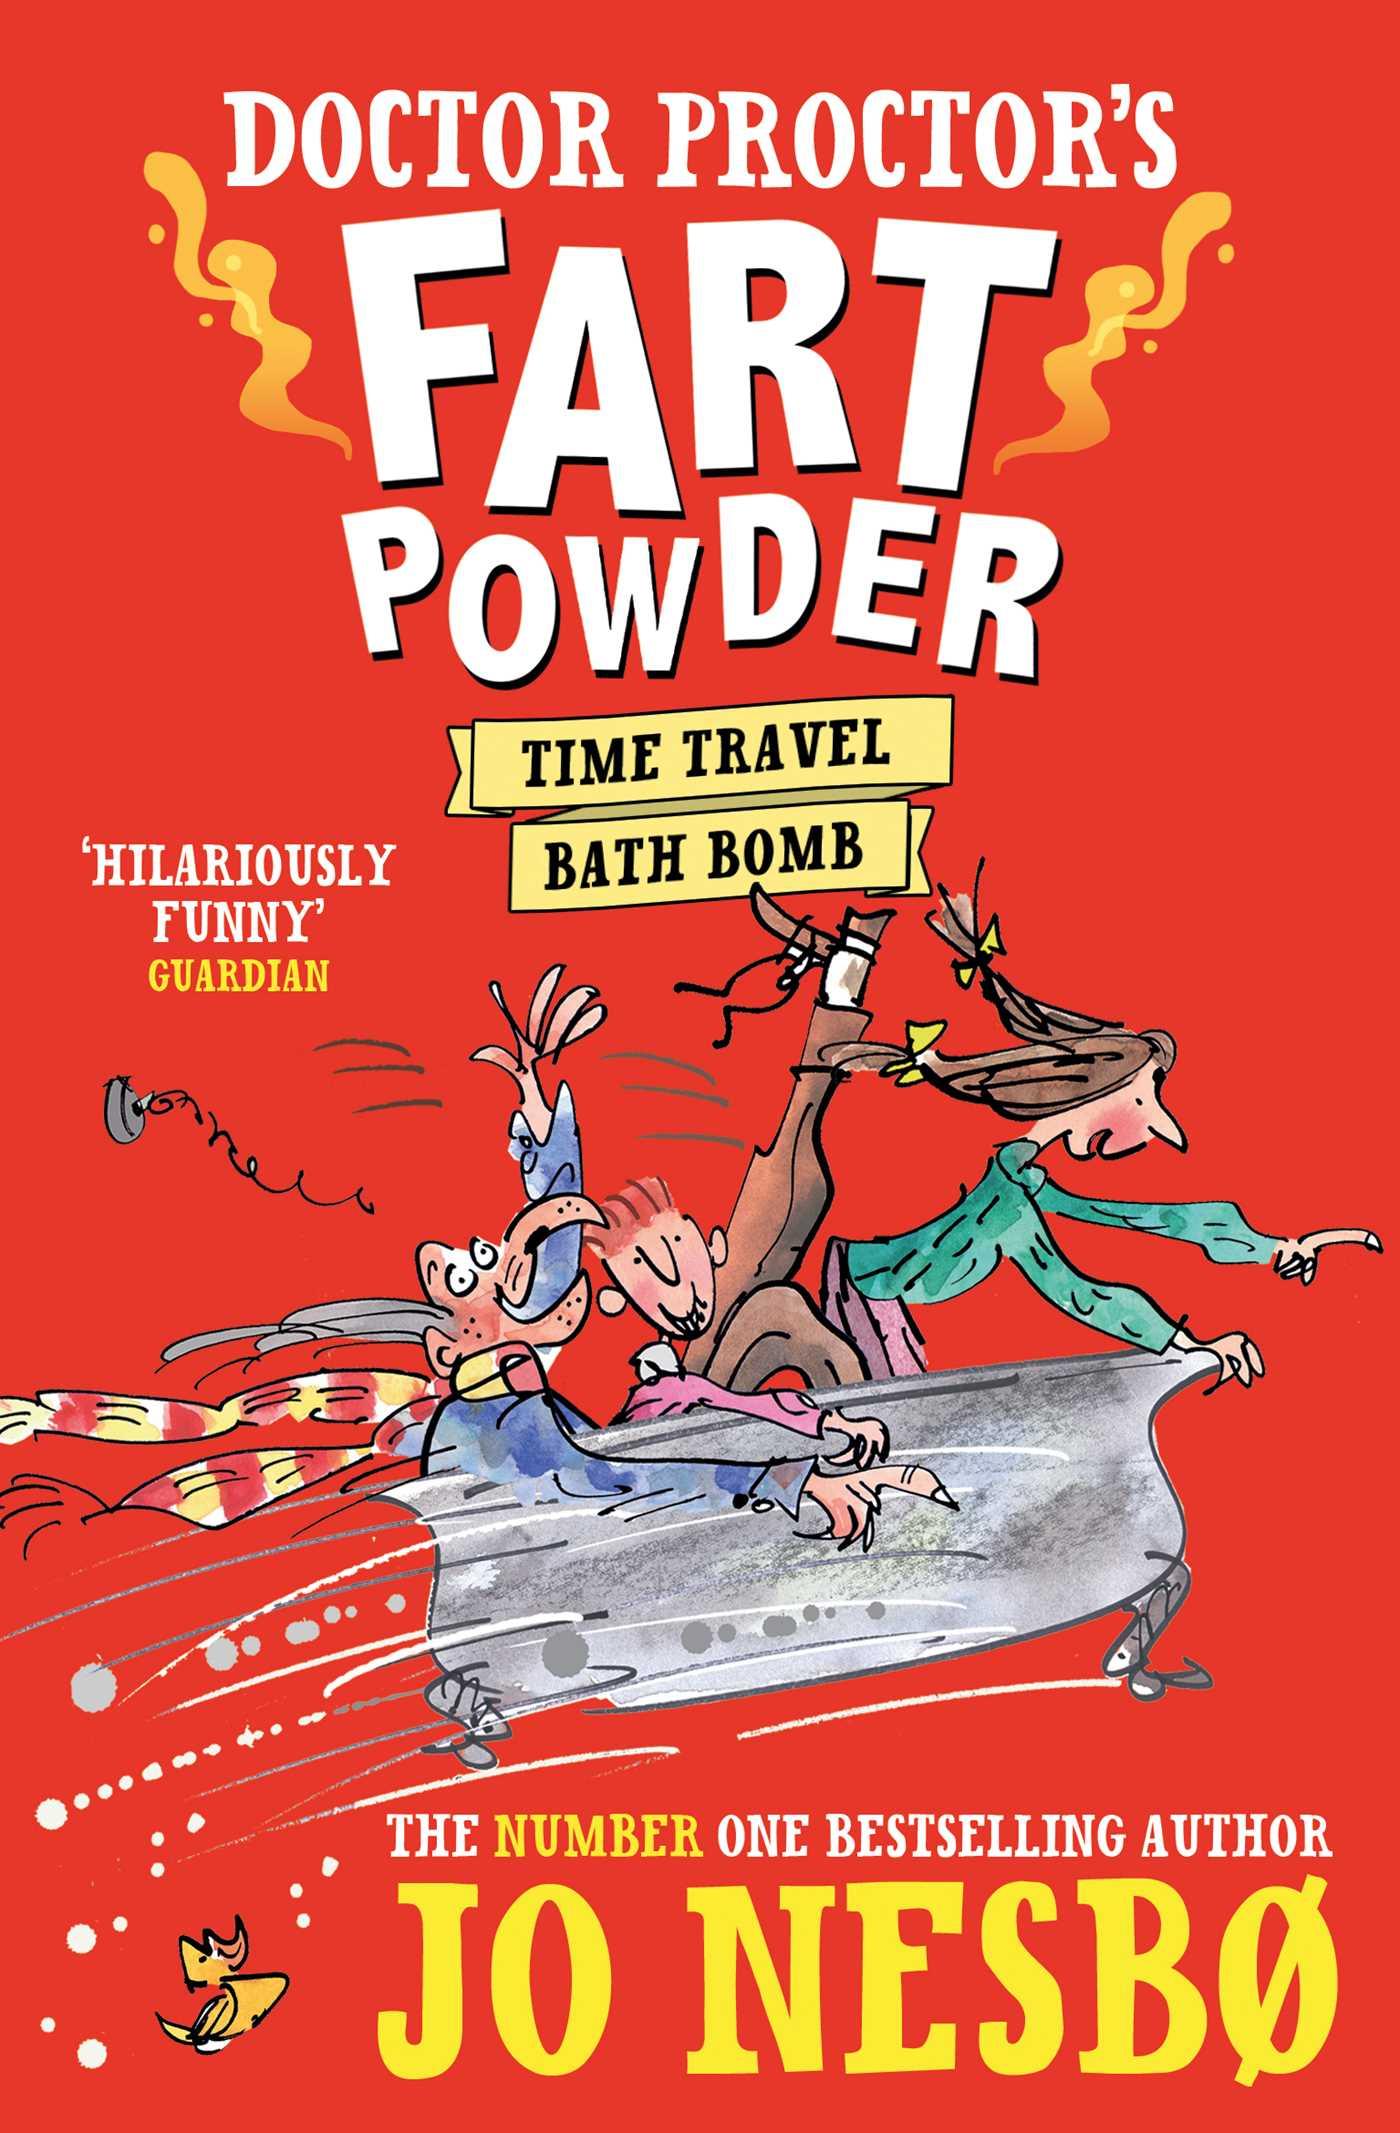 Doctor proctors fart powder time travel bath bomb 9780857077134 hr